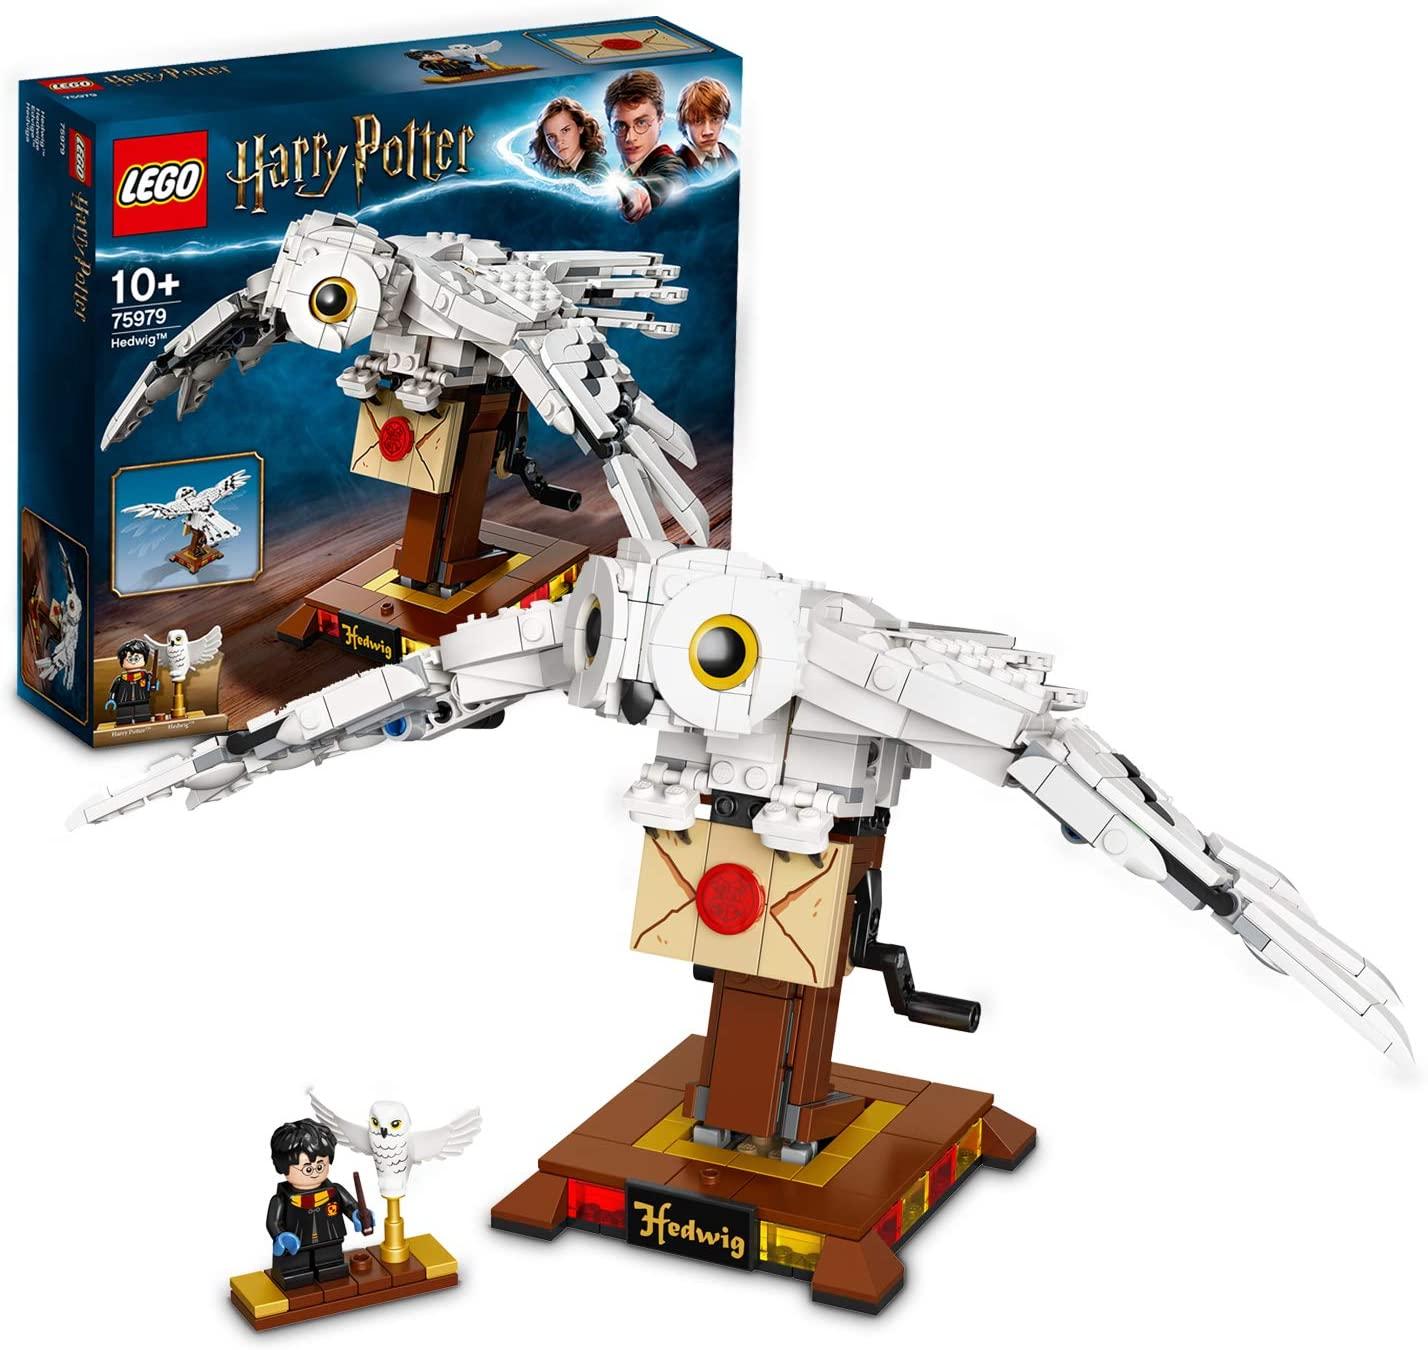 Jeu de construction Lego Harry Potter - Hedwig (75979)